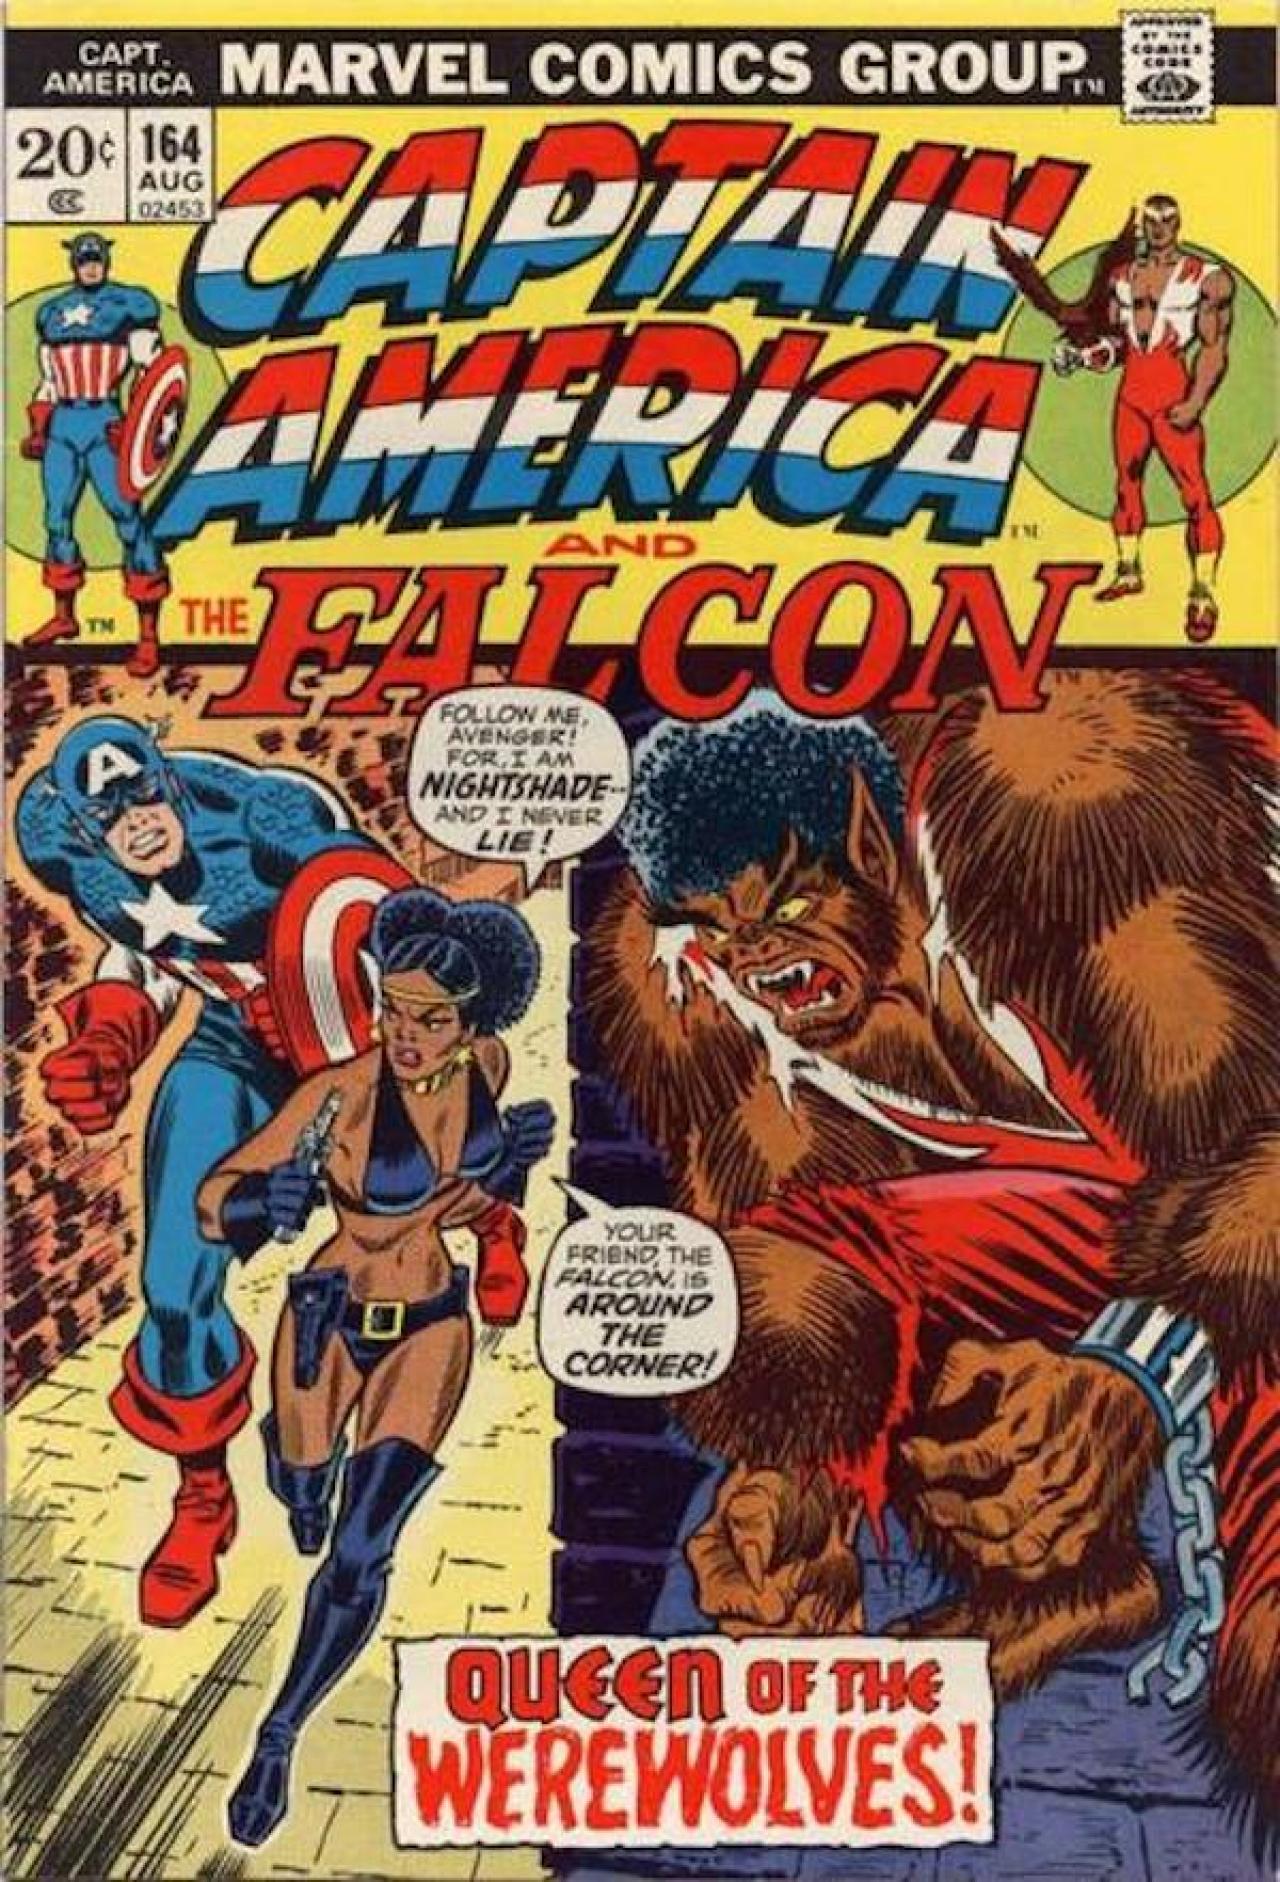 Captain America Vol.1 #164, Août, 1973